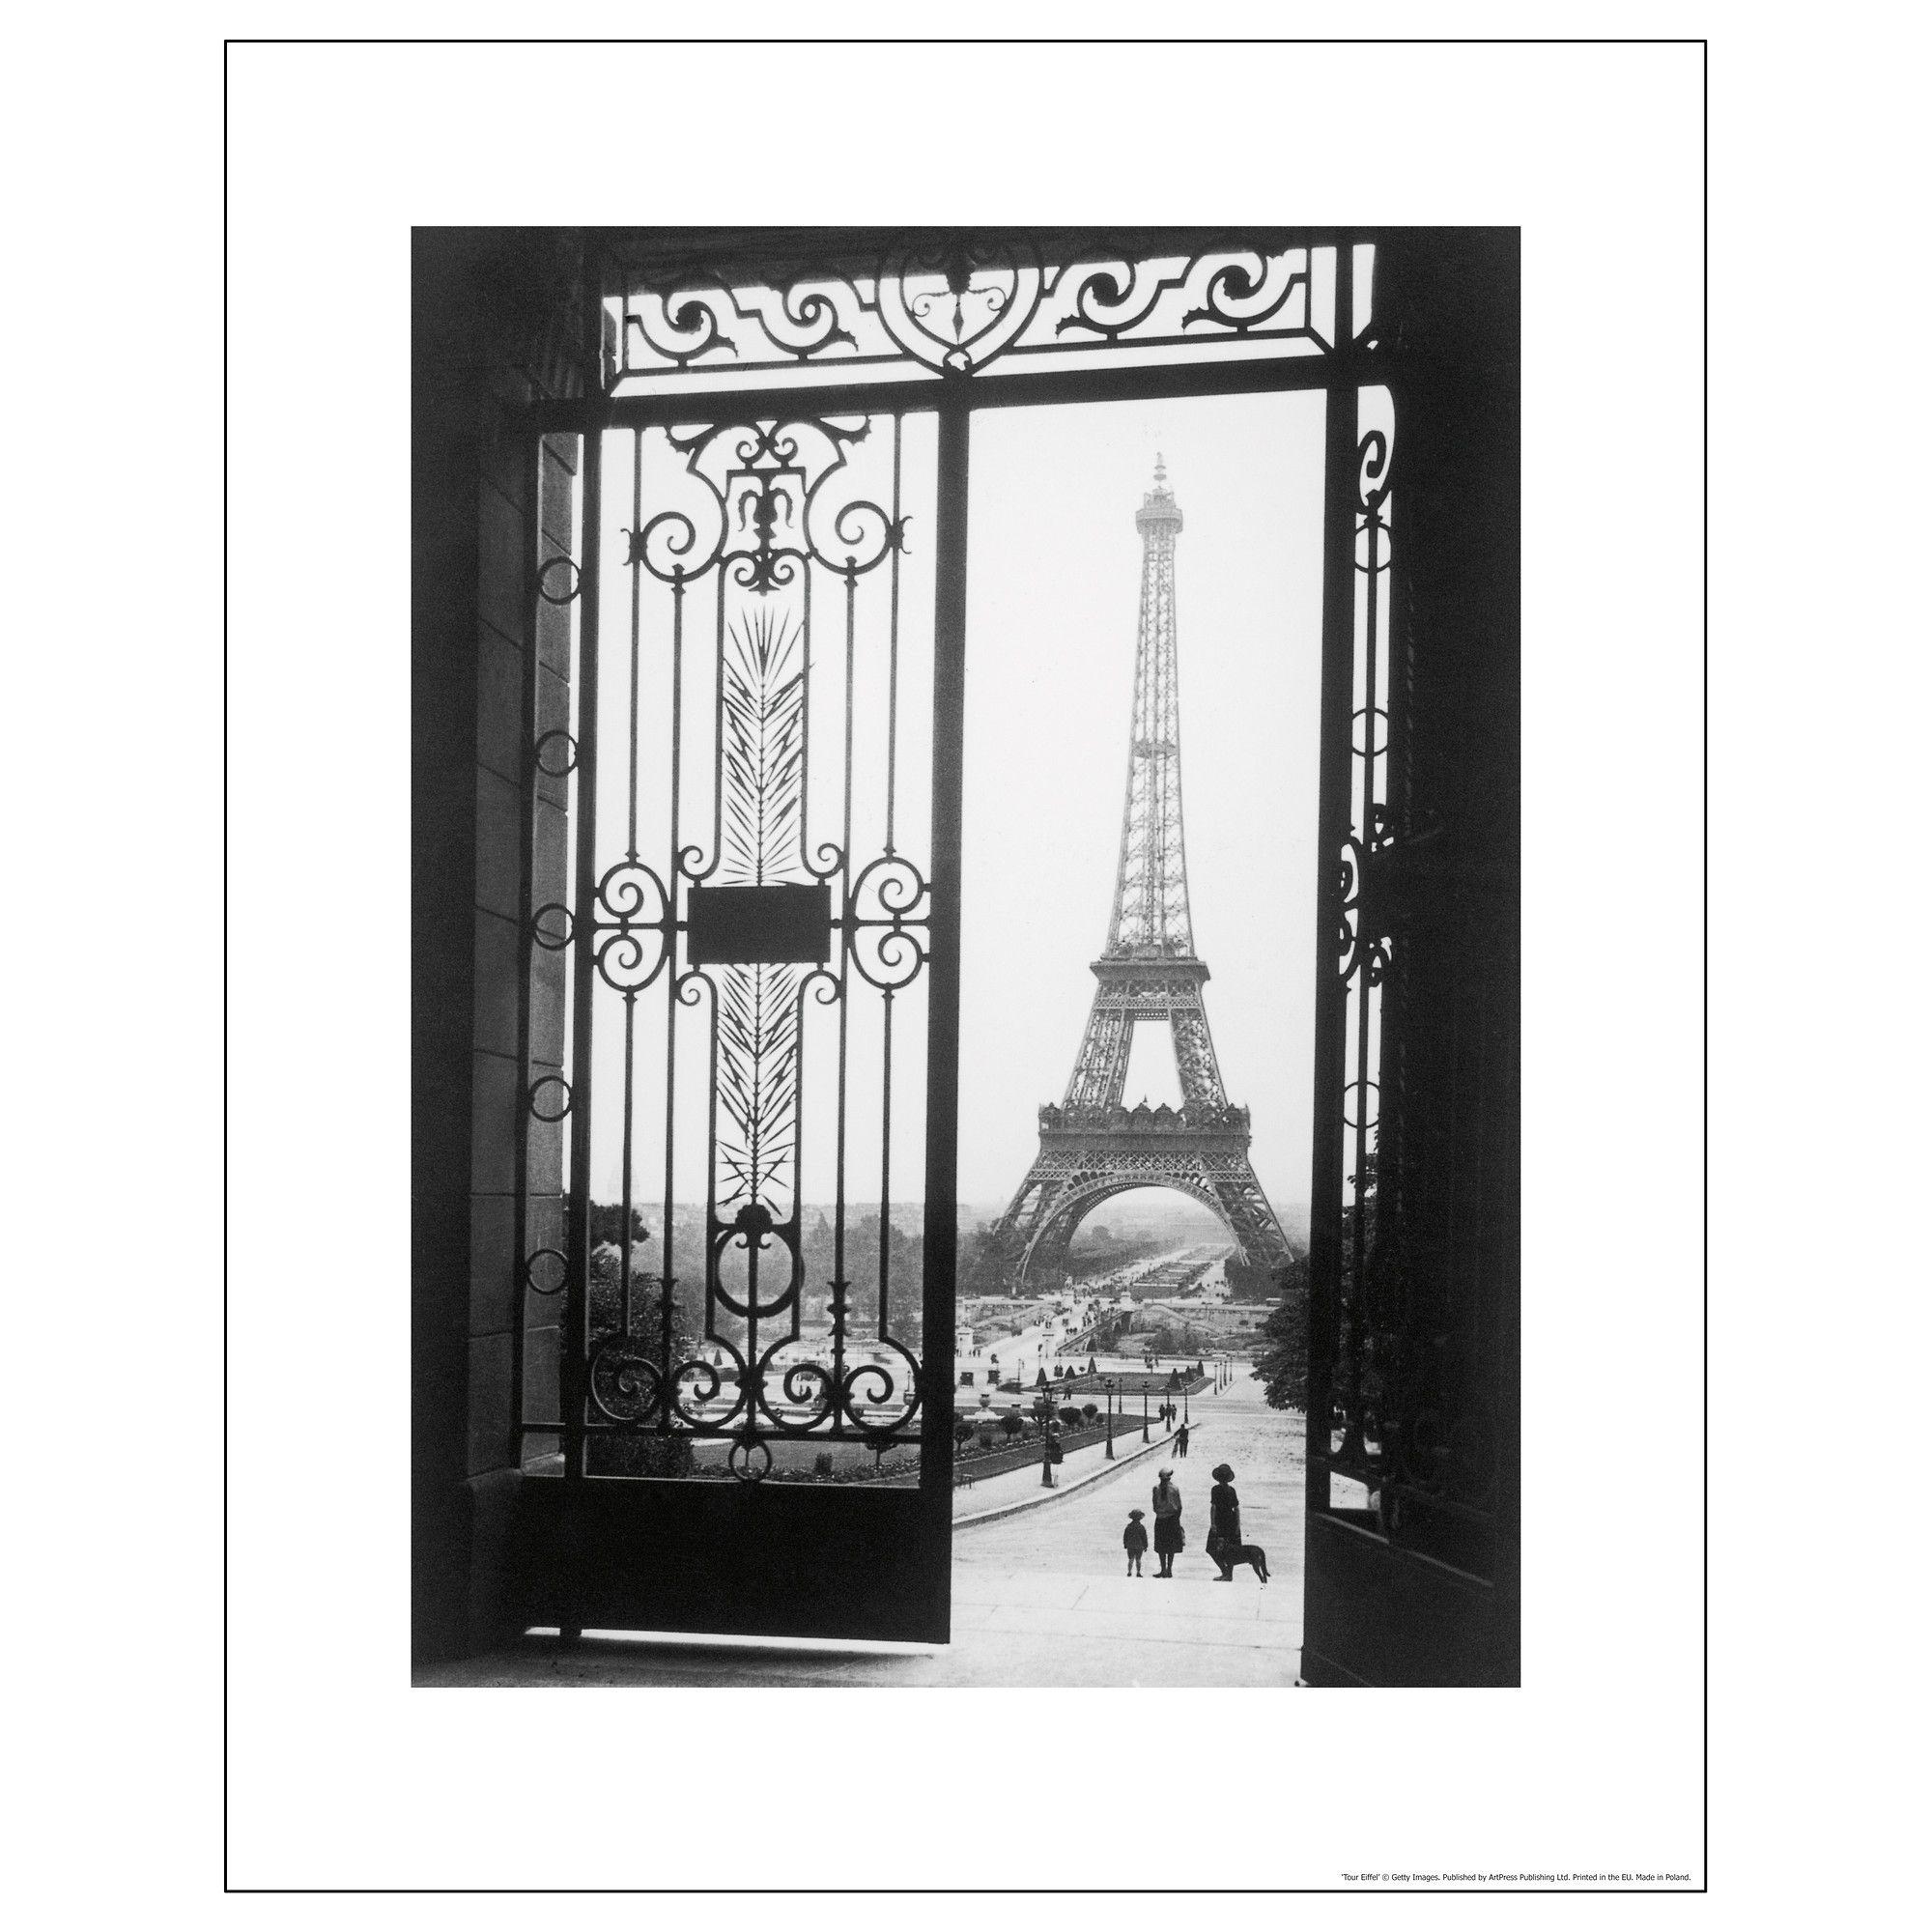 bild poster ikea paris scene pinterest spaces and tower. Black Bedroom Furniture Sets. Home Design Ideas